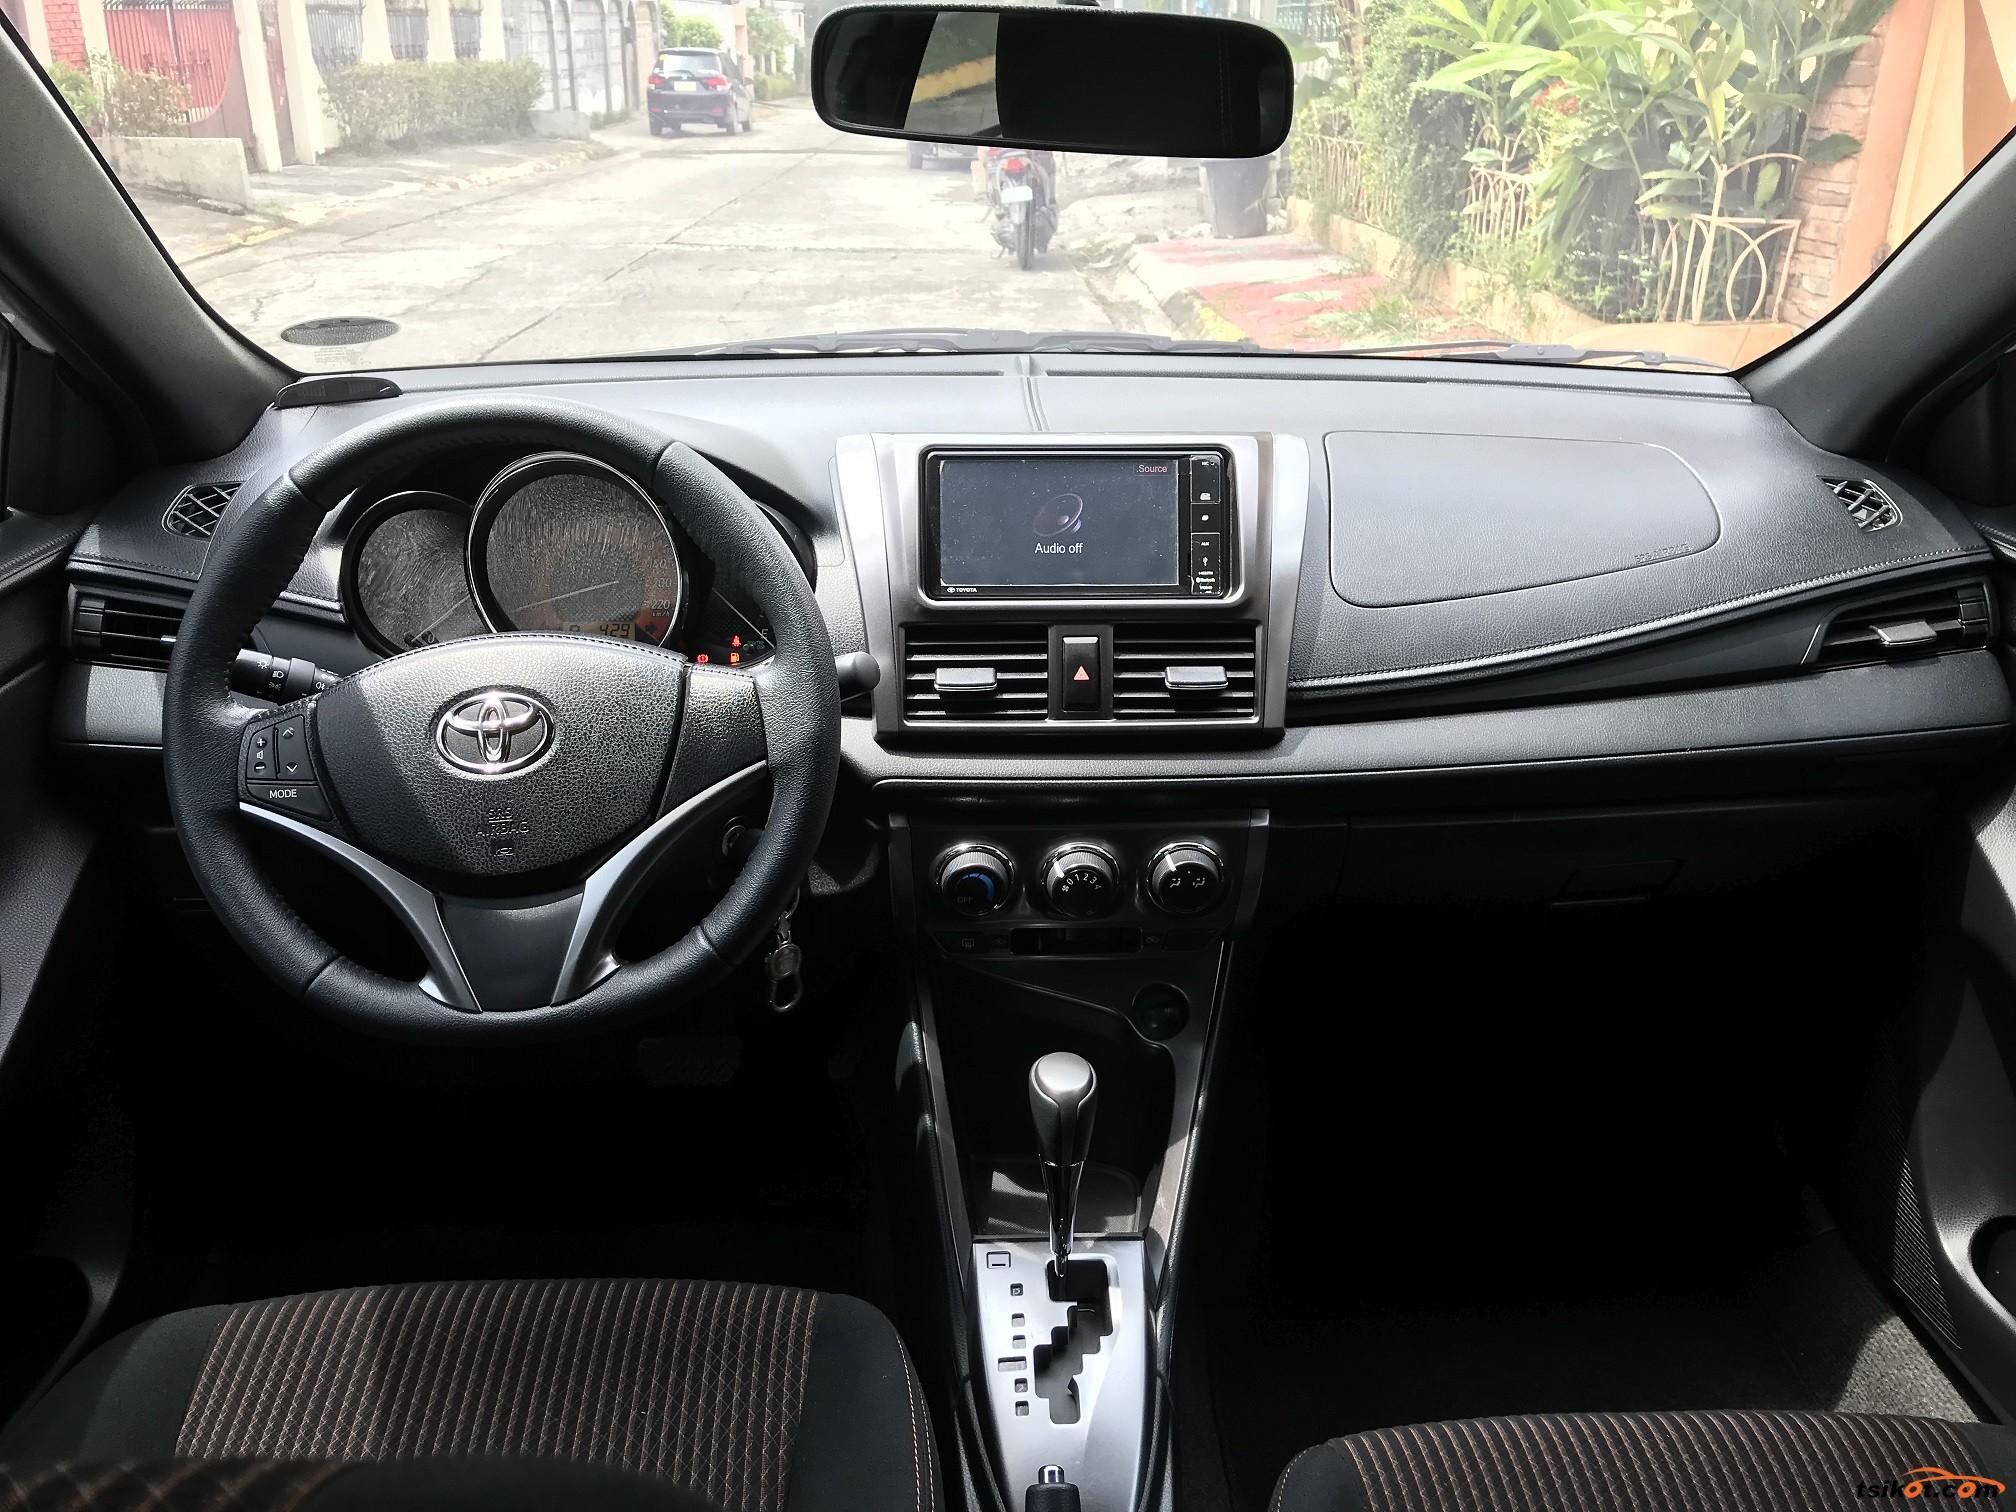 Toyota Yaris 2015 - 8